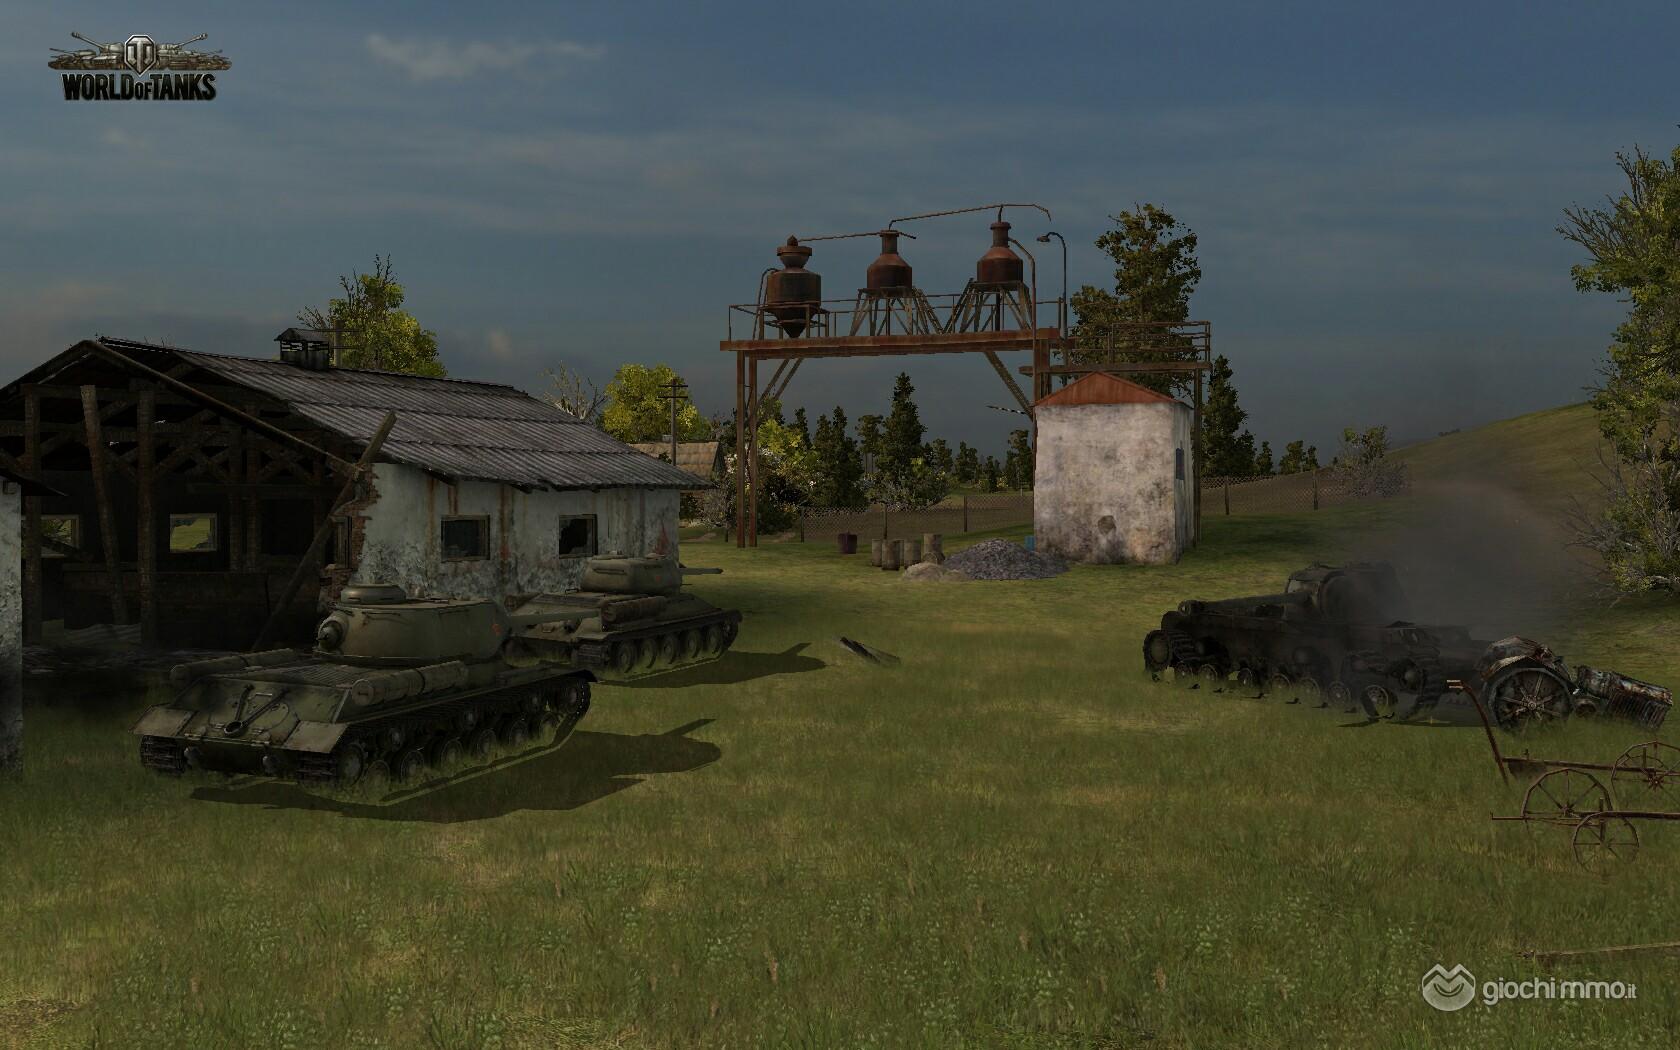 Clicca sull'immagine per ingrandirlaNome:   World of Tanks screen7.jpgVisite: 92Dimensione:   371.9 KBID: 8202